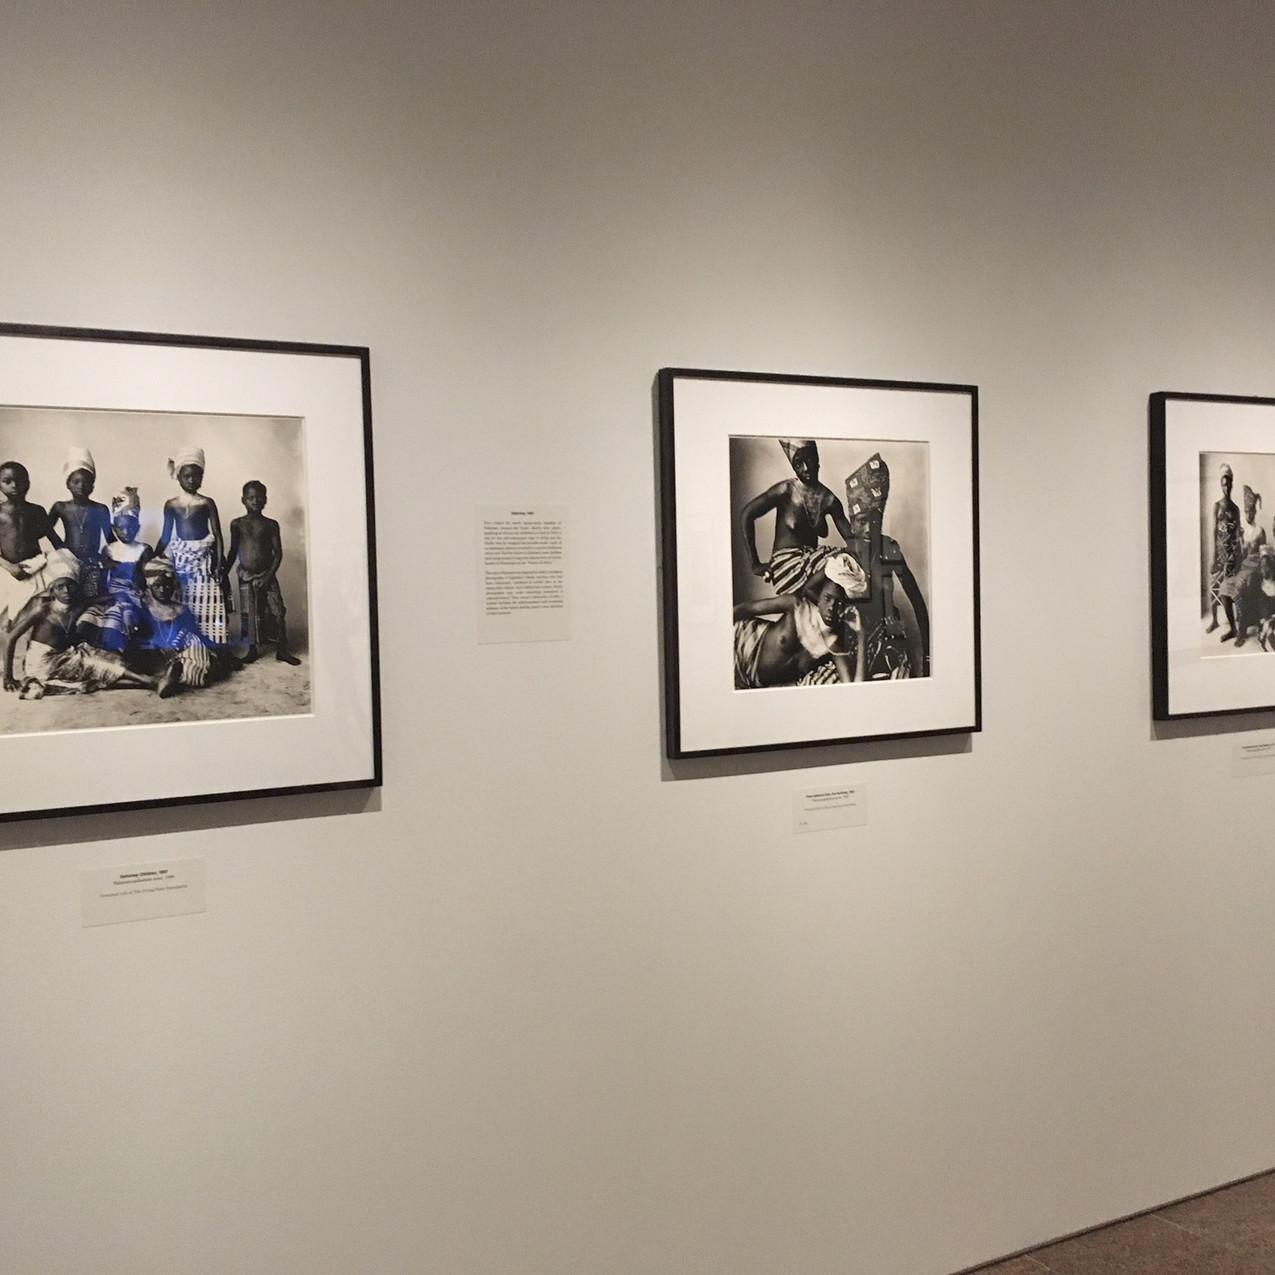 Irving Penn, Dahomey Children (1967) Platinum-palladium print, 22 x 26 in.  Irving Penn, Three Dahomey Girls, One Reclining (1967) Platinum-palladium print, 22 x 26 in.  Irving Penn, Five Dahomey Girls, Two Standing (1967) Platinum-palladium print, 26 x 22 in.